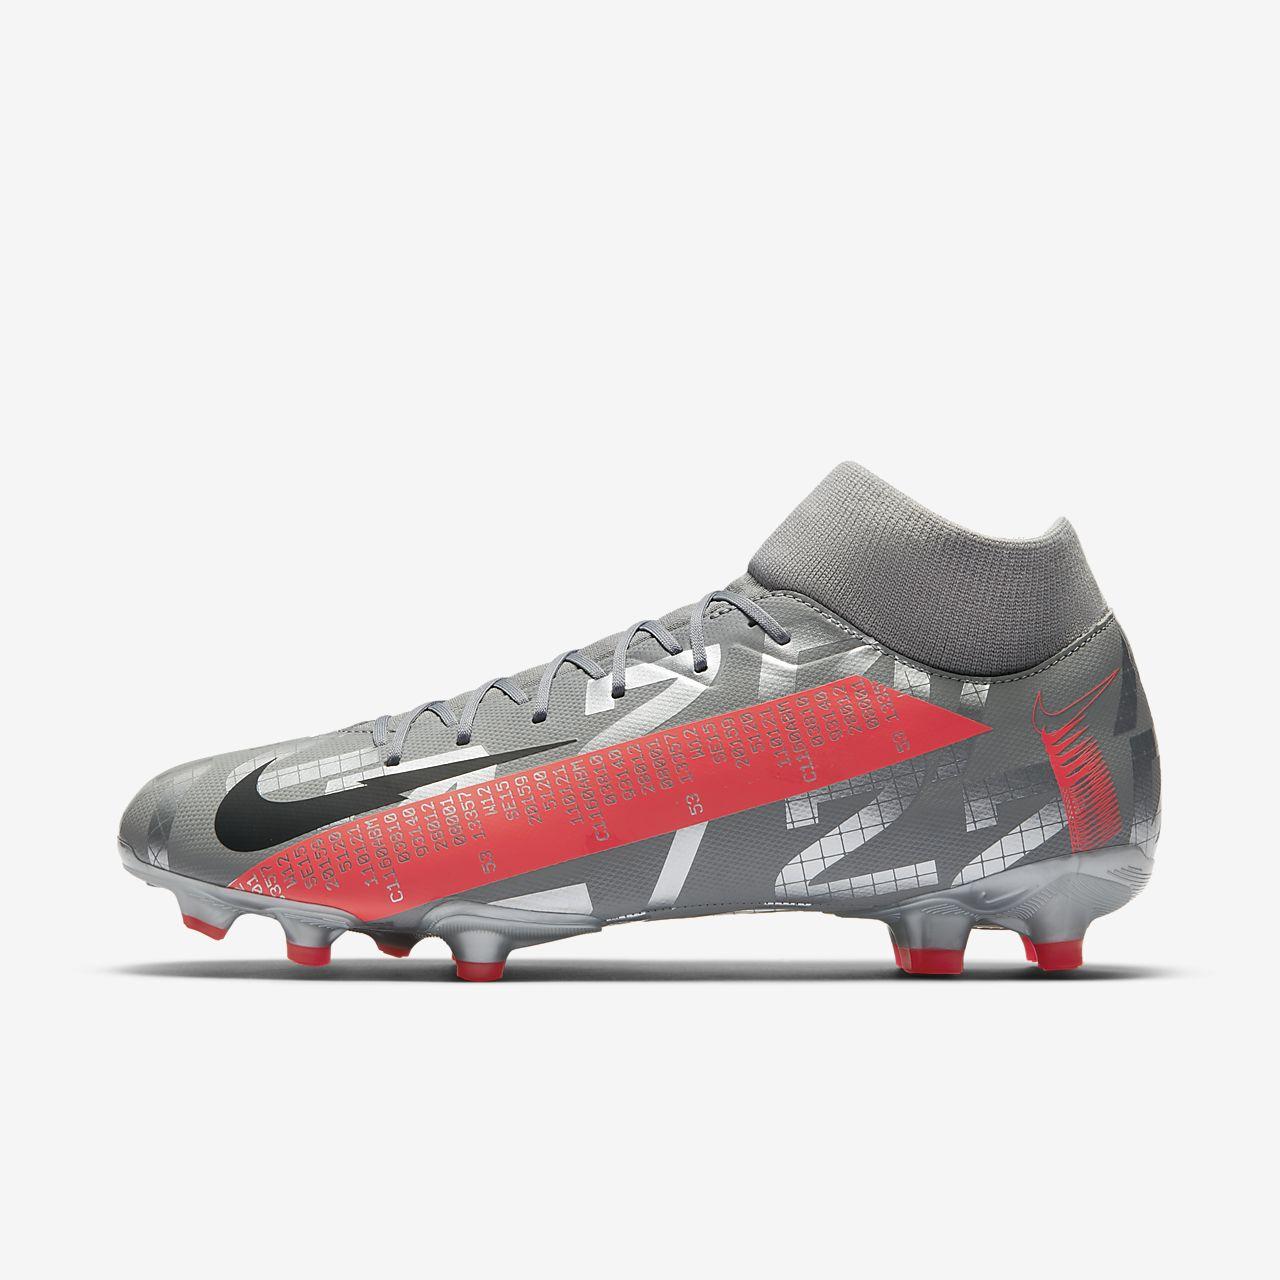 Nike Mercurial Superfly 7 Academy MG Botas de fútbol para múltiples  superficies